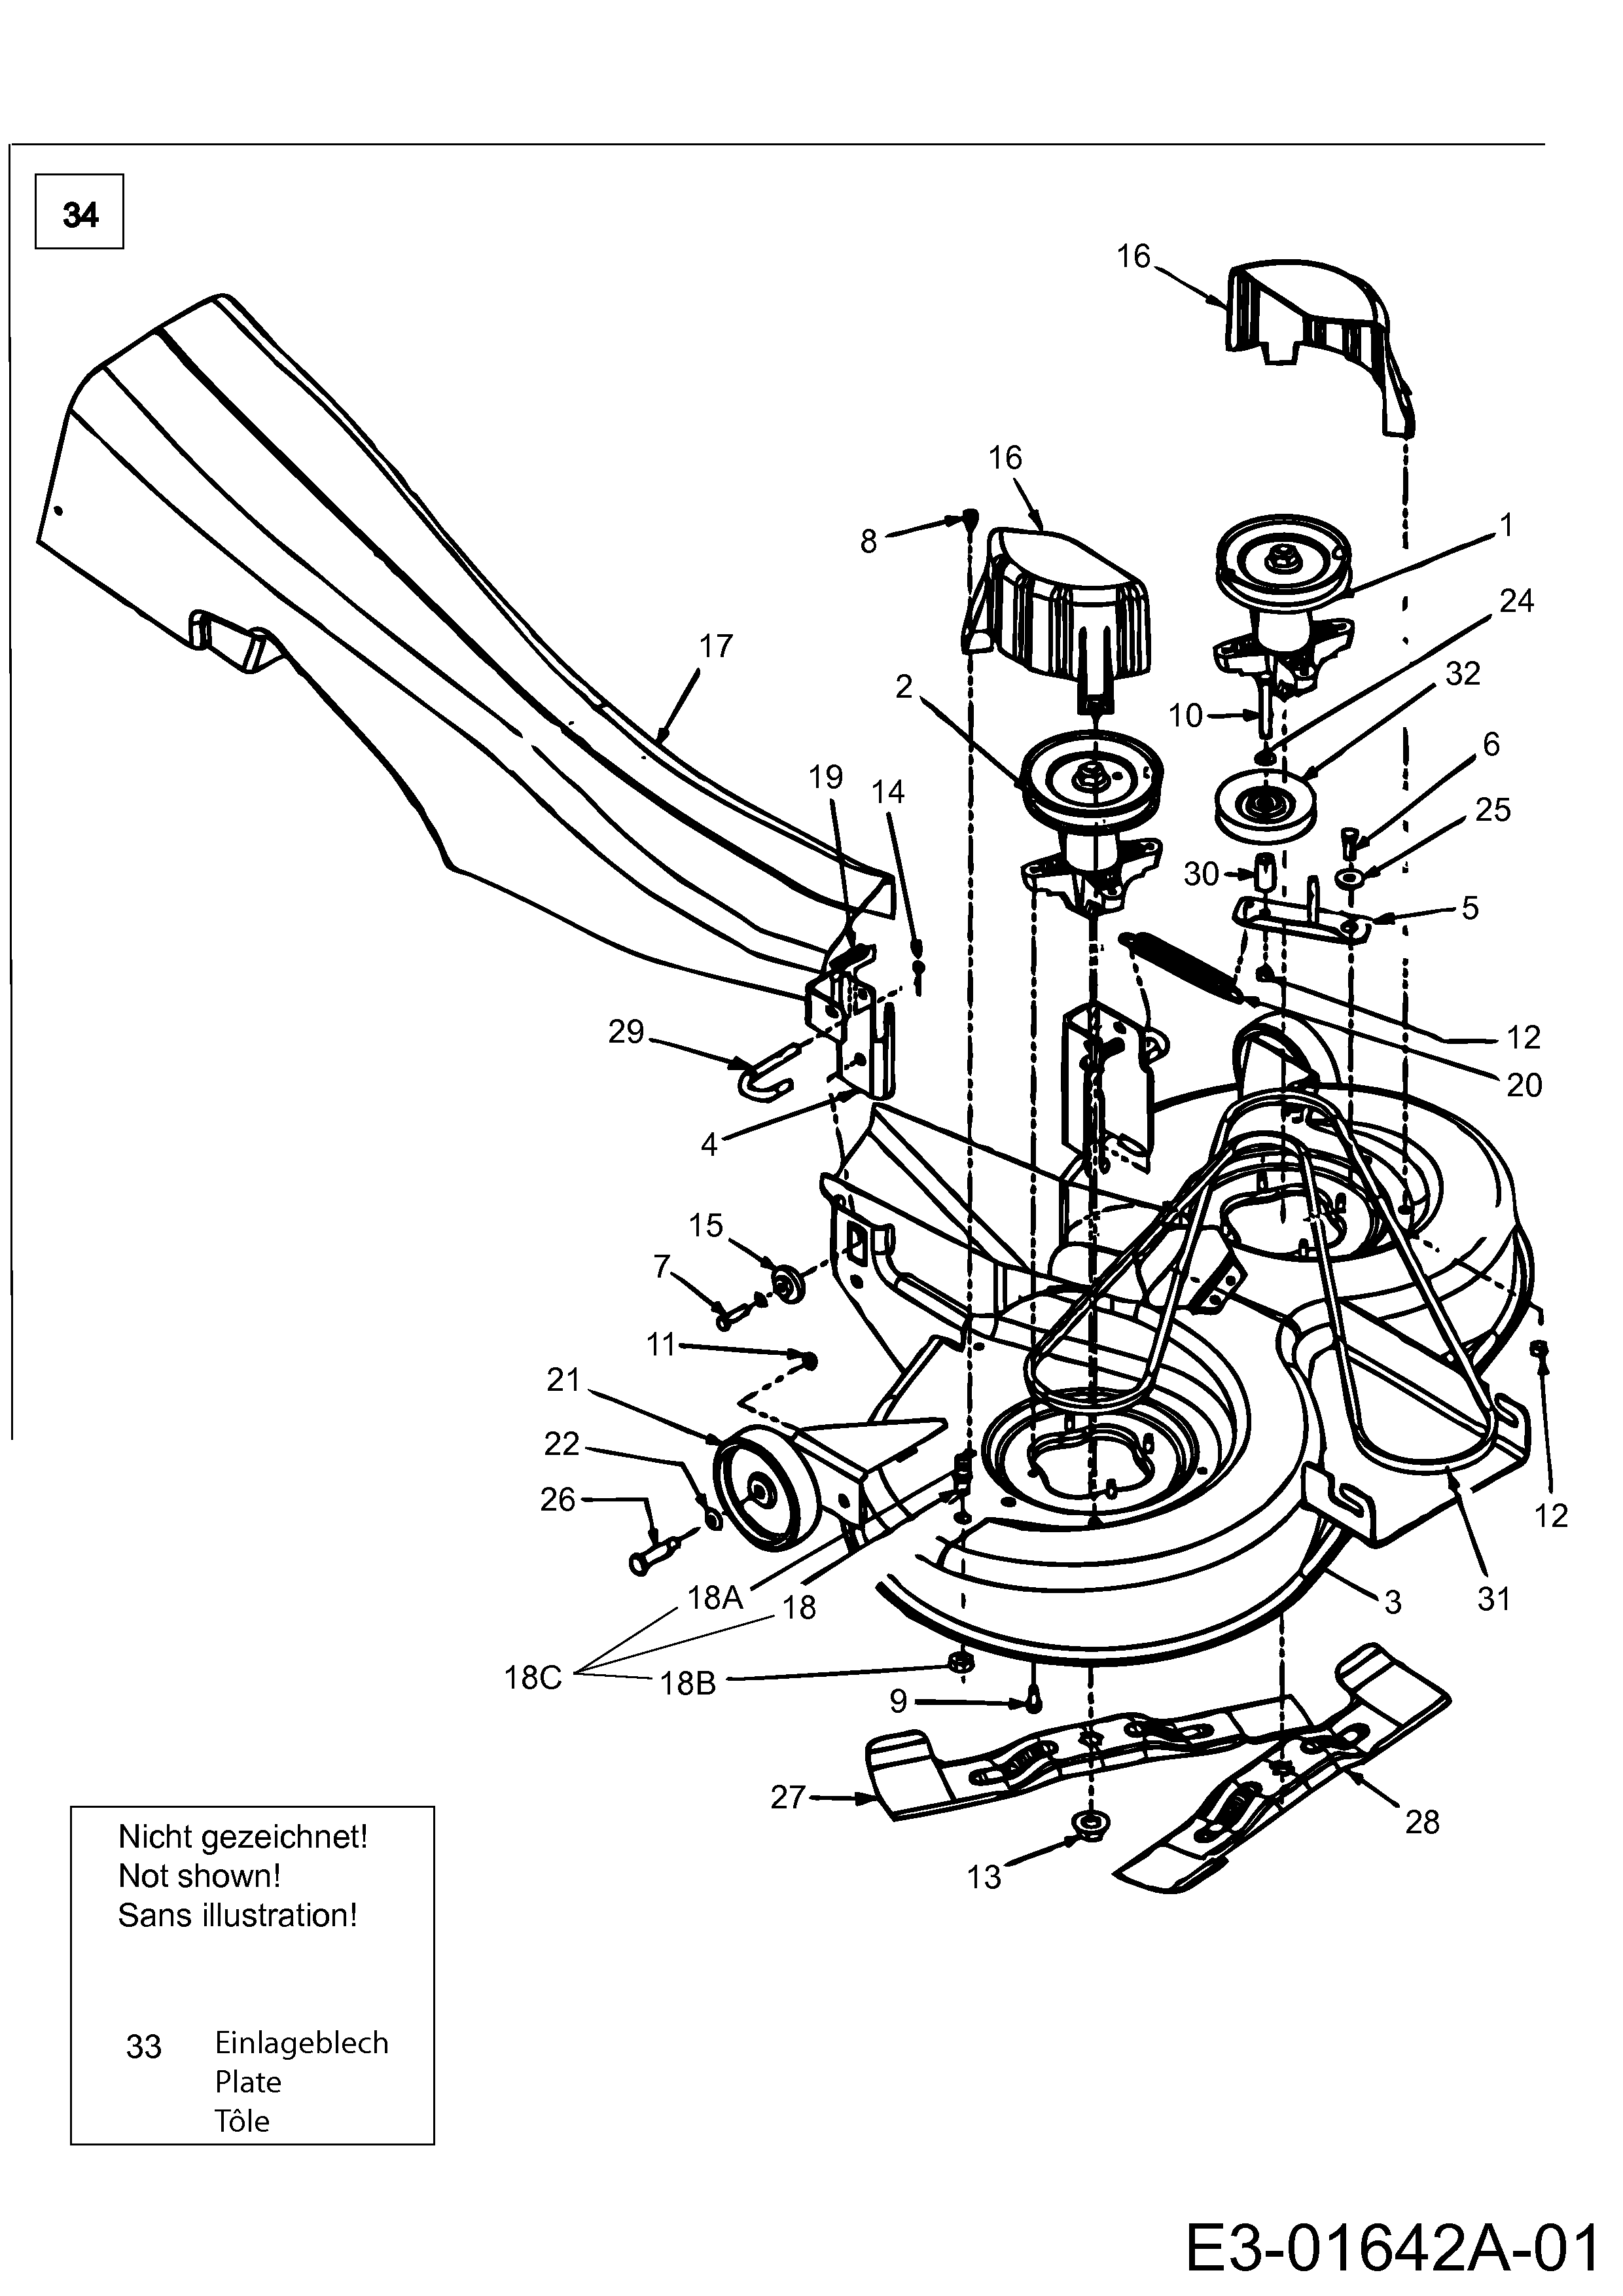 Messersatz passend Gutbrod GLX 92 RH 13ED51GE490 Heckauswurf Rasentraktor